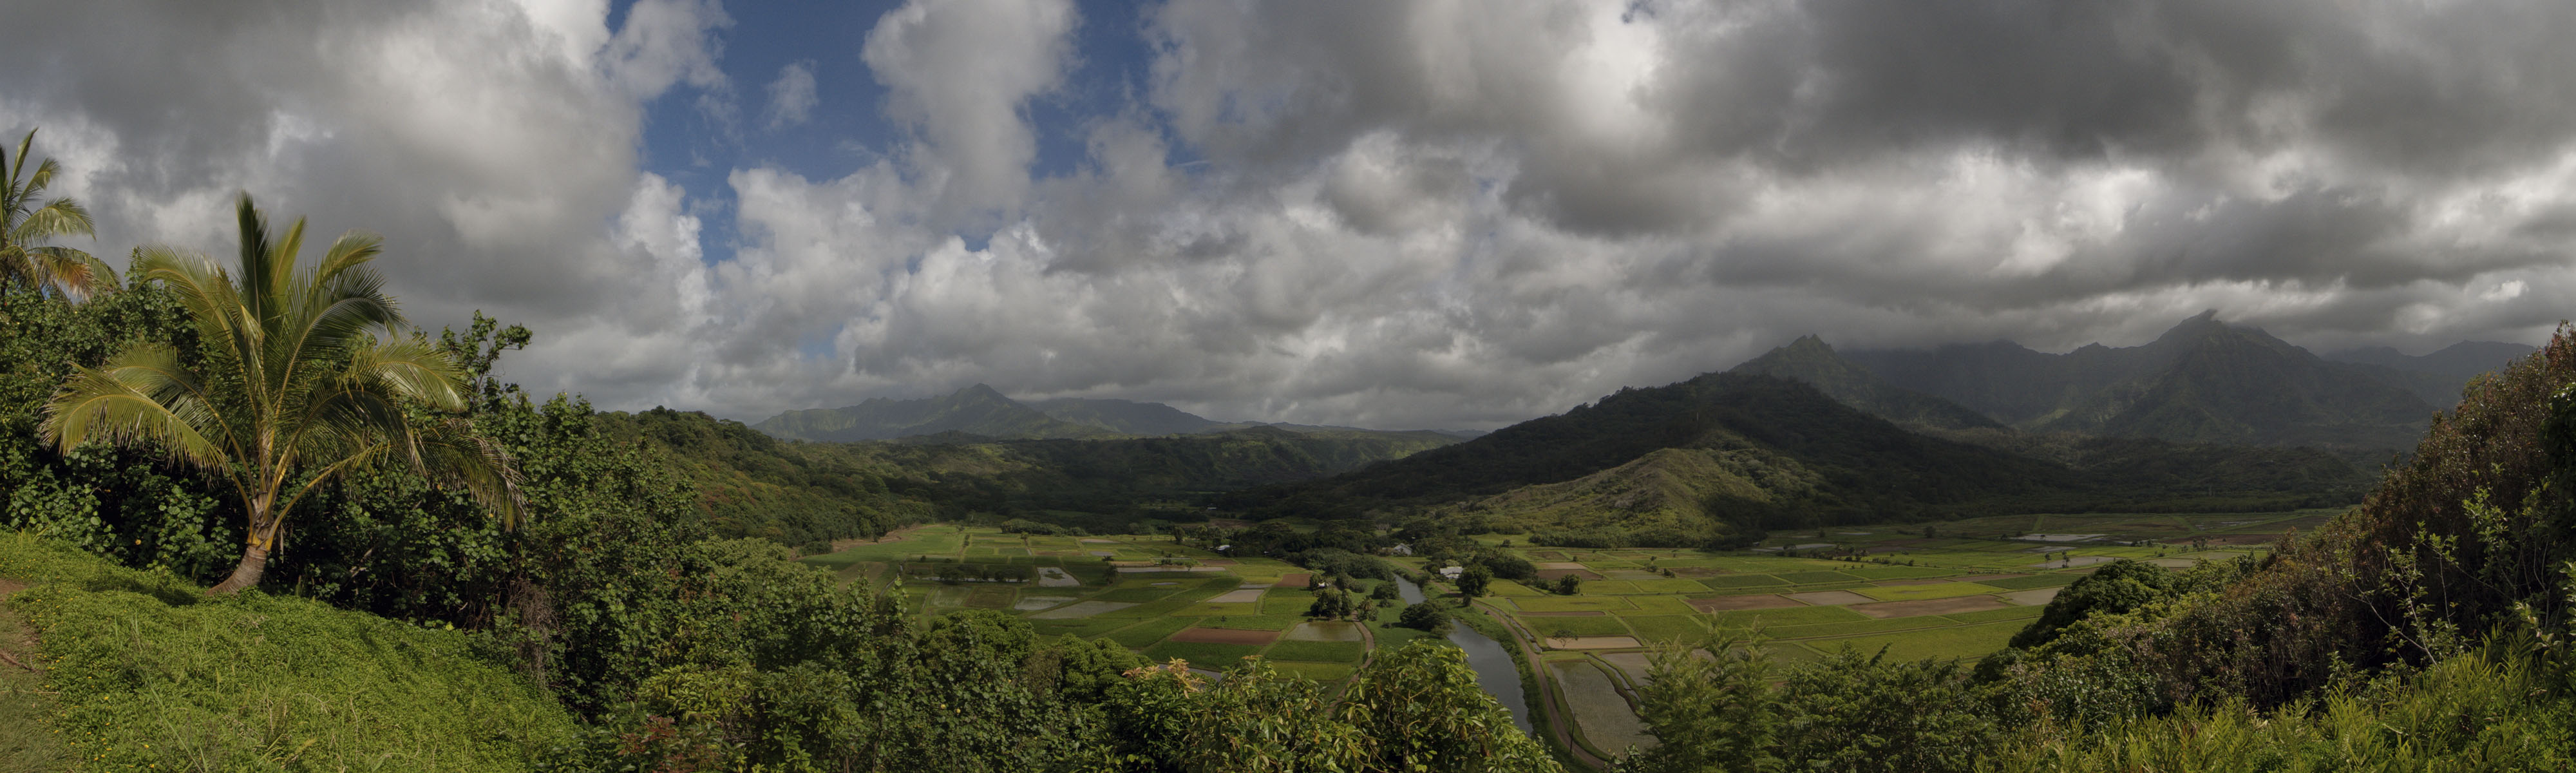 Hanalei Valley, Kaua'i HI